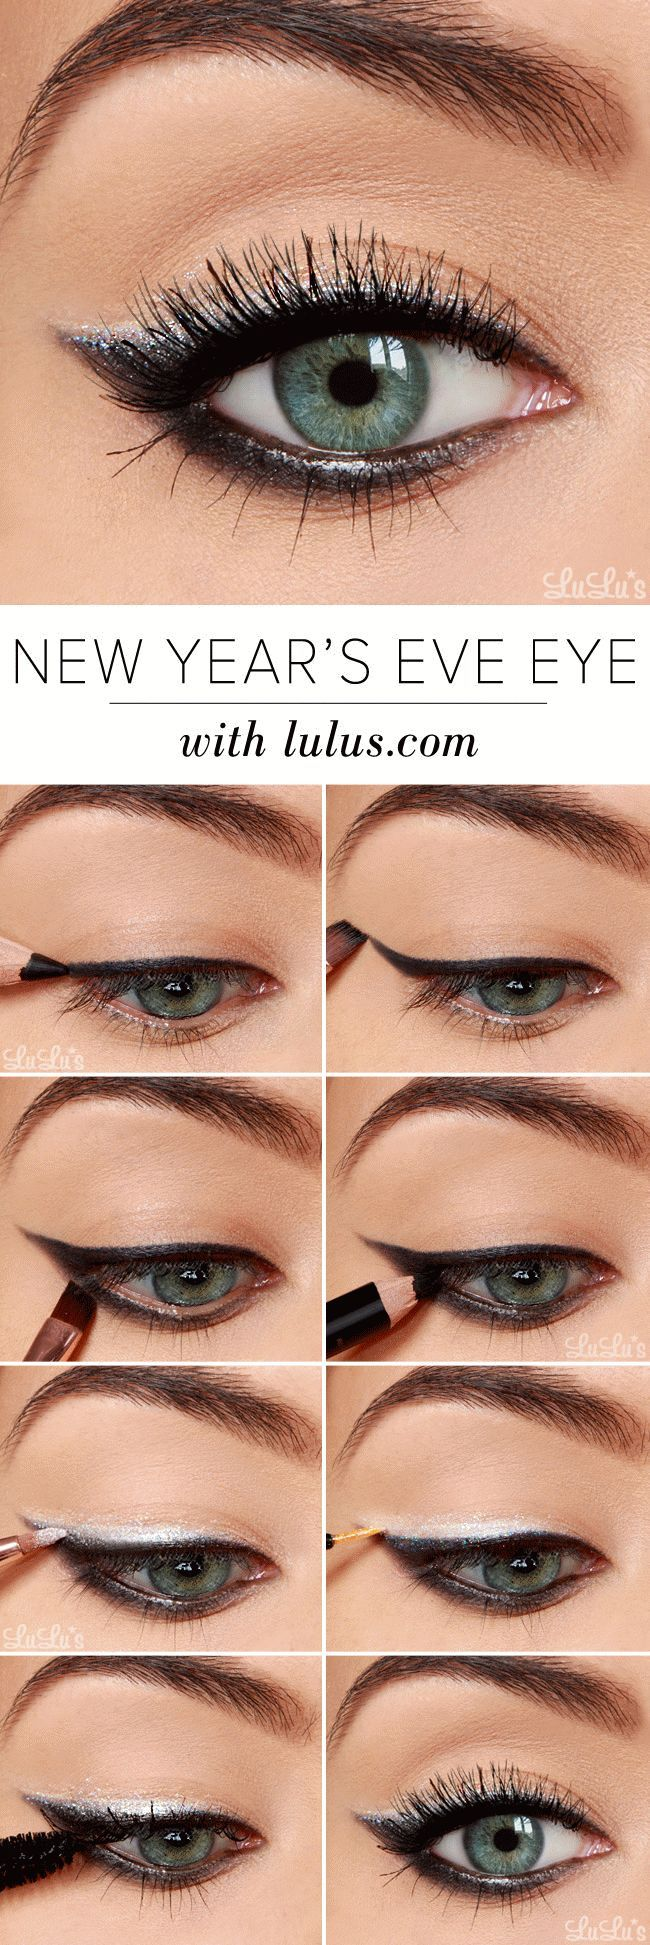 Eve Eyeshadow Tutorial